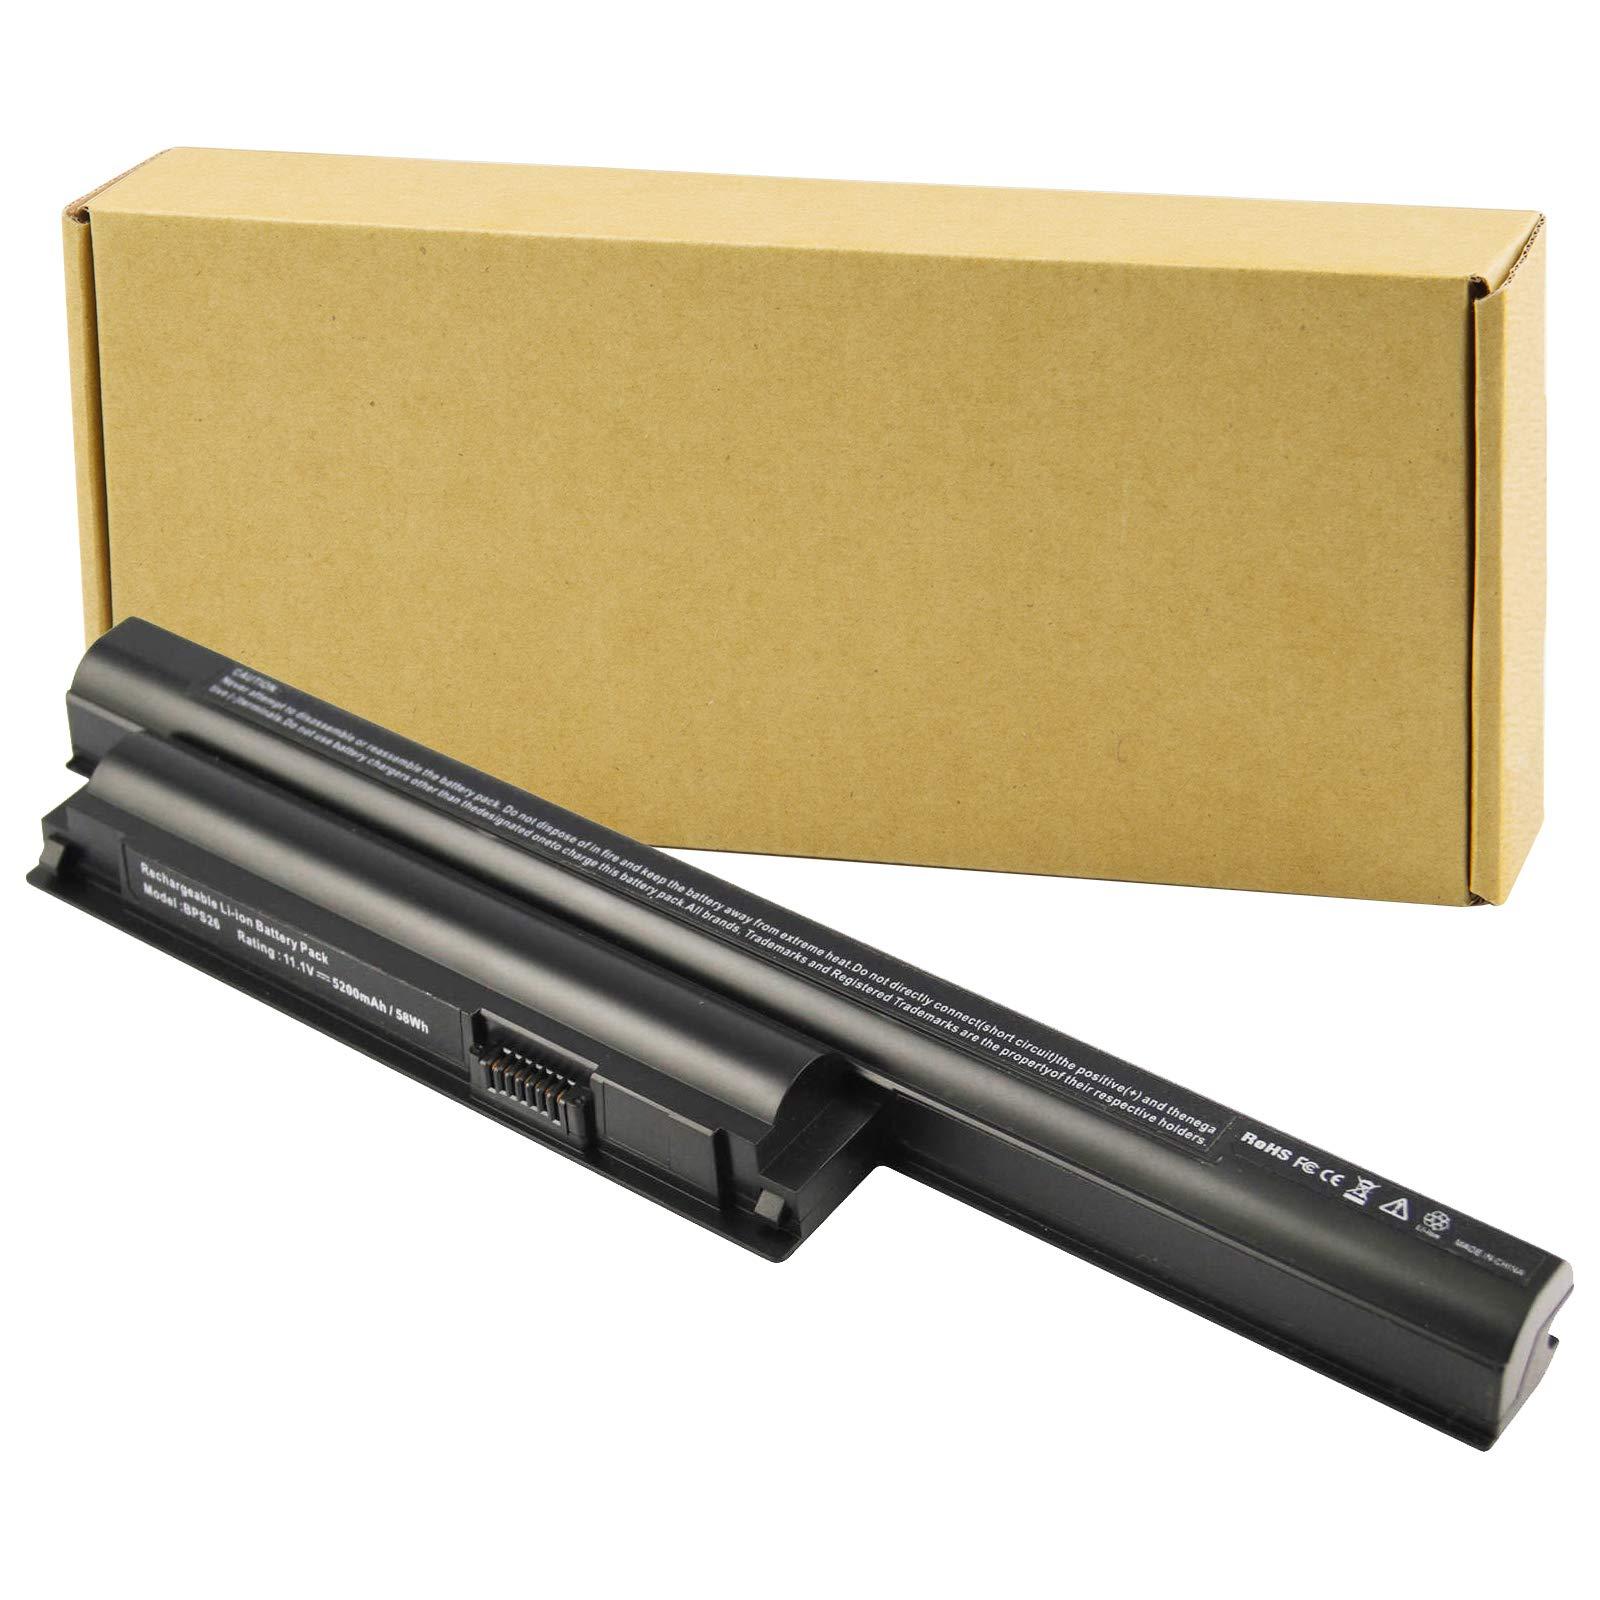 BPS26 New Laptop Battery fit Sony VAIO VGP-BPS26 VGP-BPL26 VGP-BPS26A PCG-61A12L PCG-61A13L PCG-61A14L PCG-71713L PCG-71912L PCG-71913L -Futurebatt